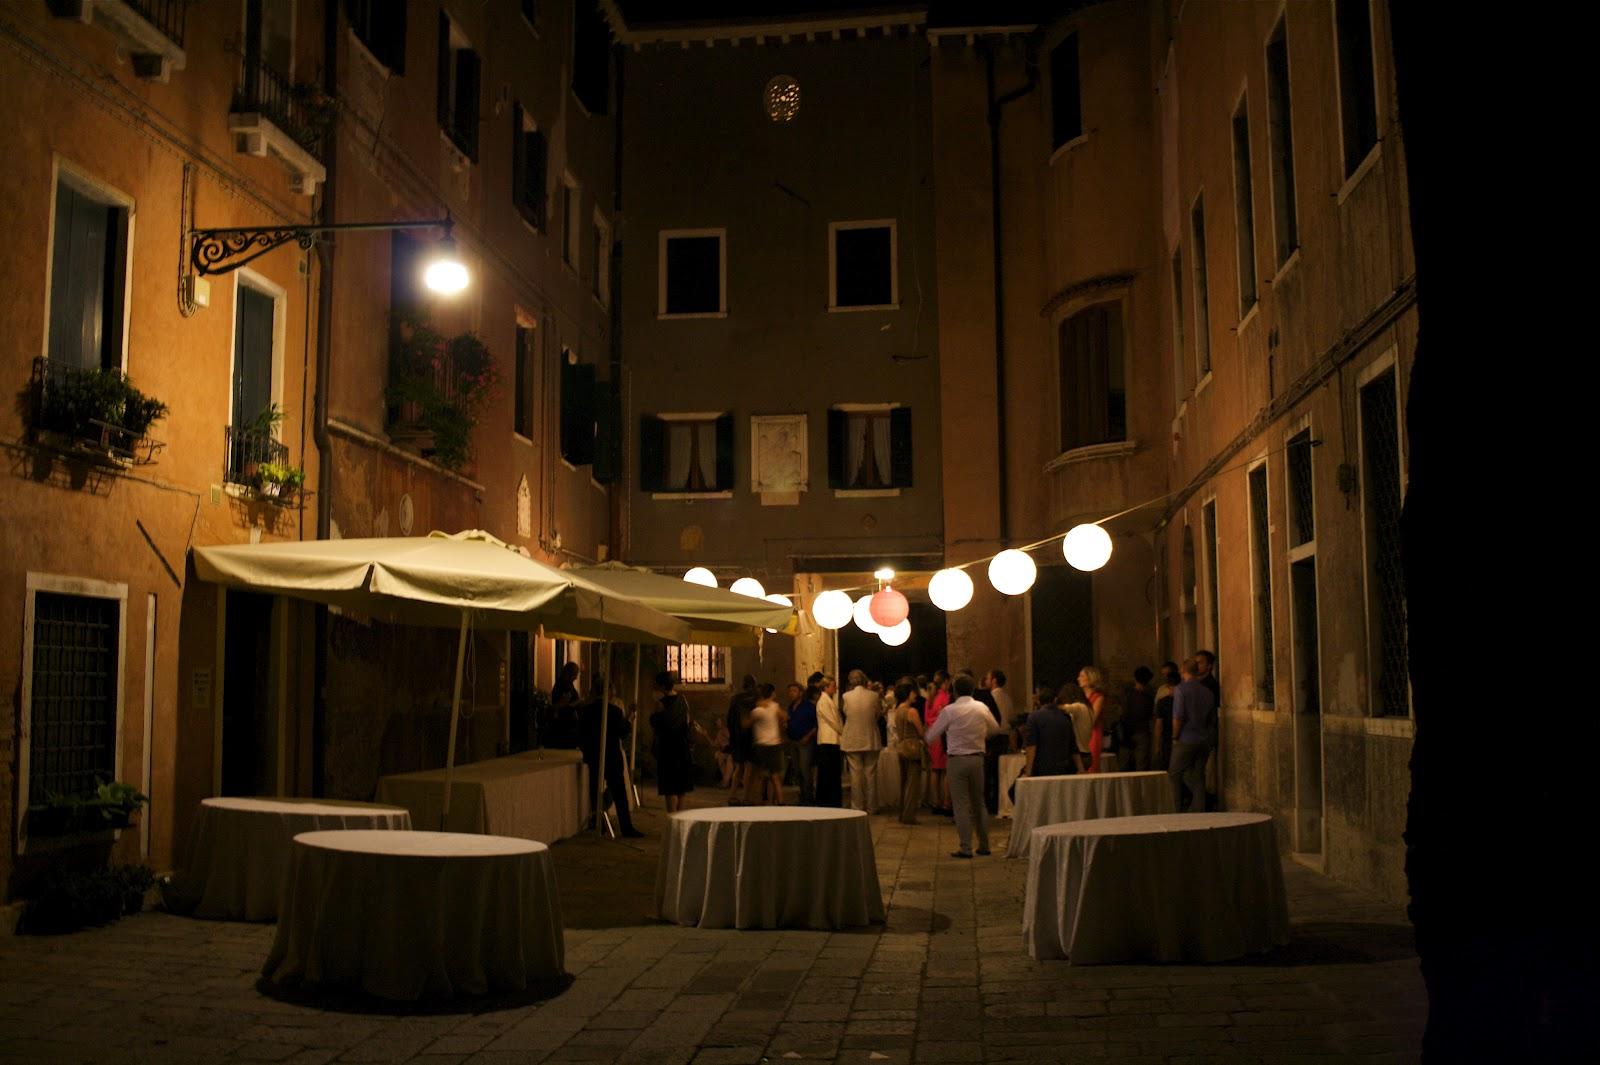 venezia blog: august 2012